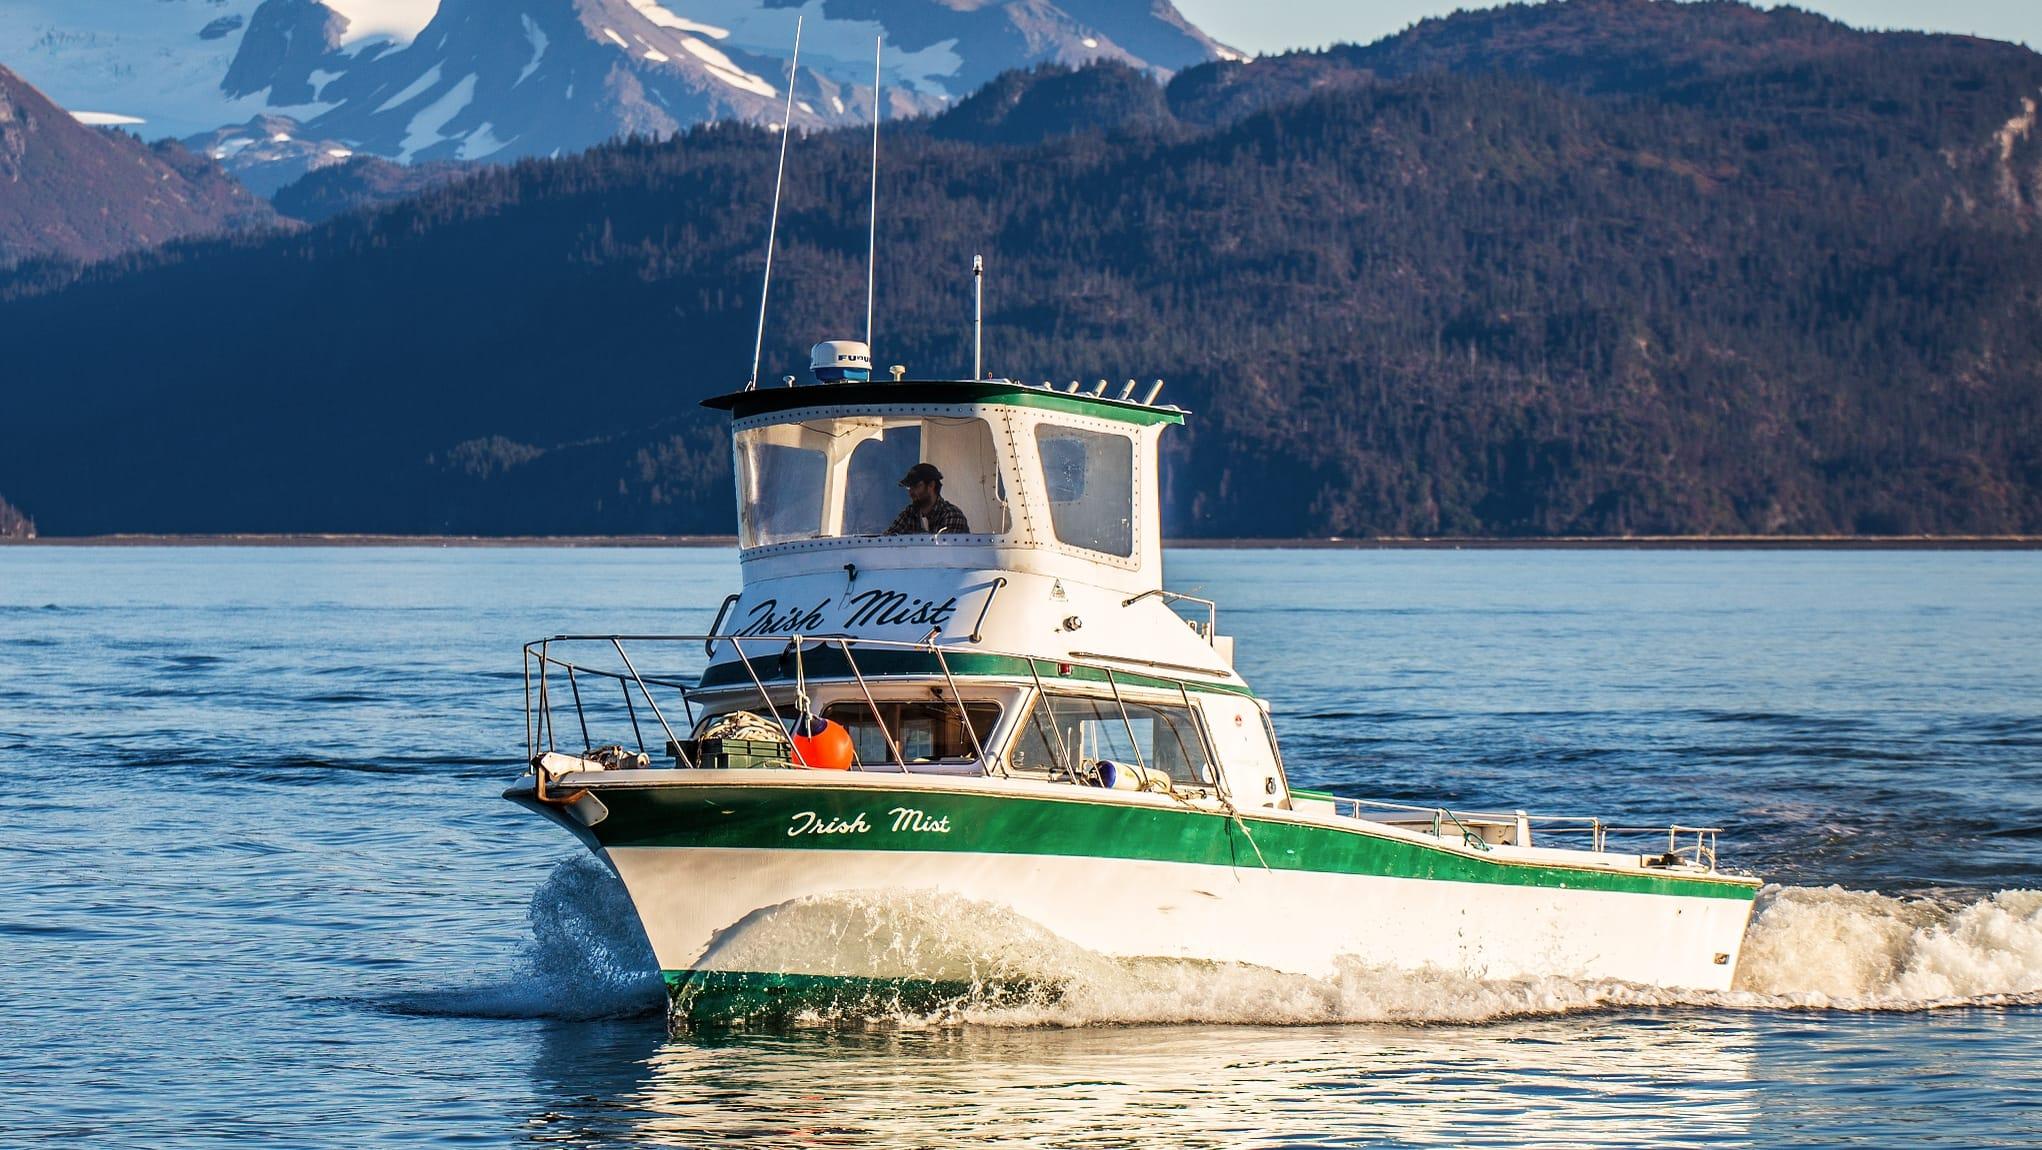 The Irish Mist charter fishing boat from DeepStrike Sportfishing in Homer Alaska